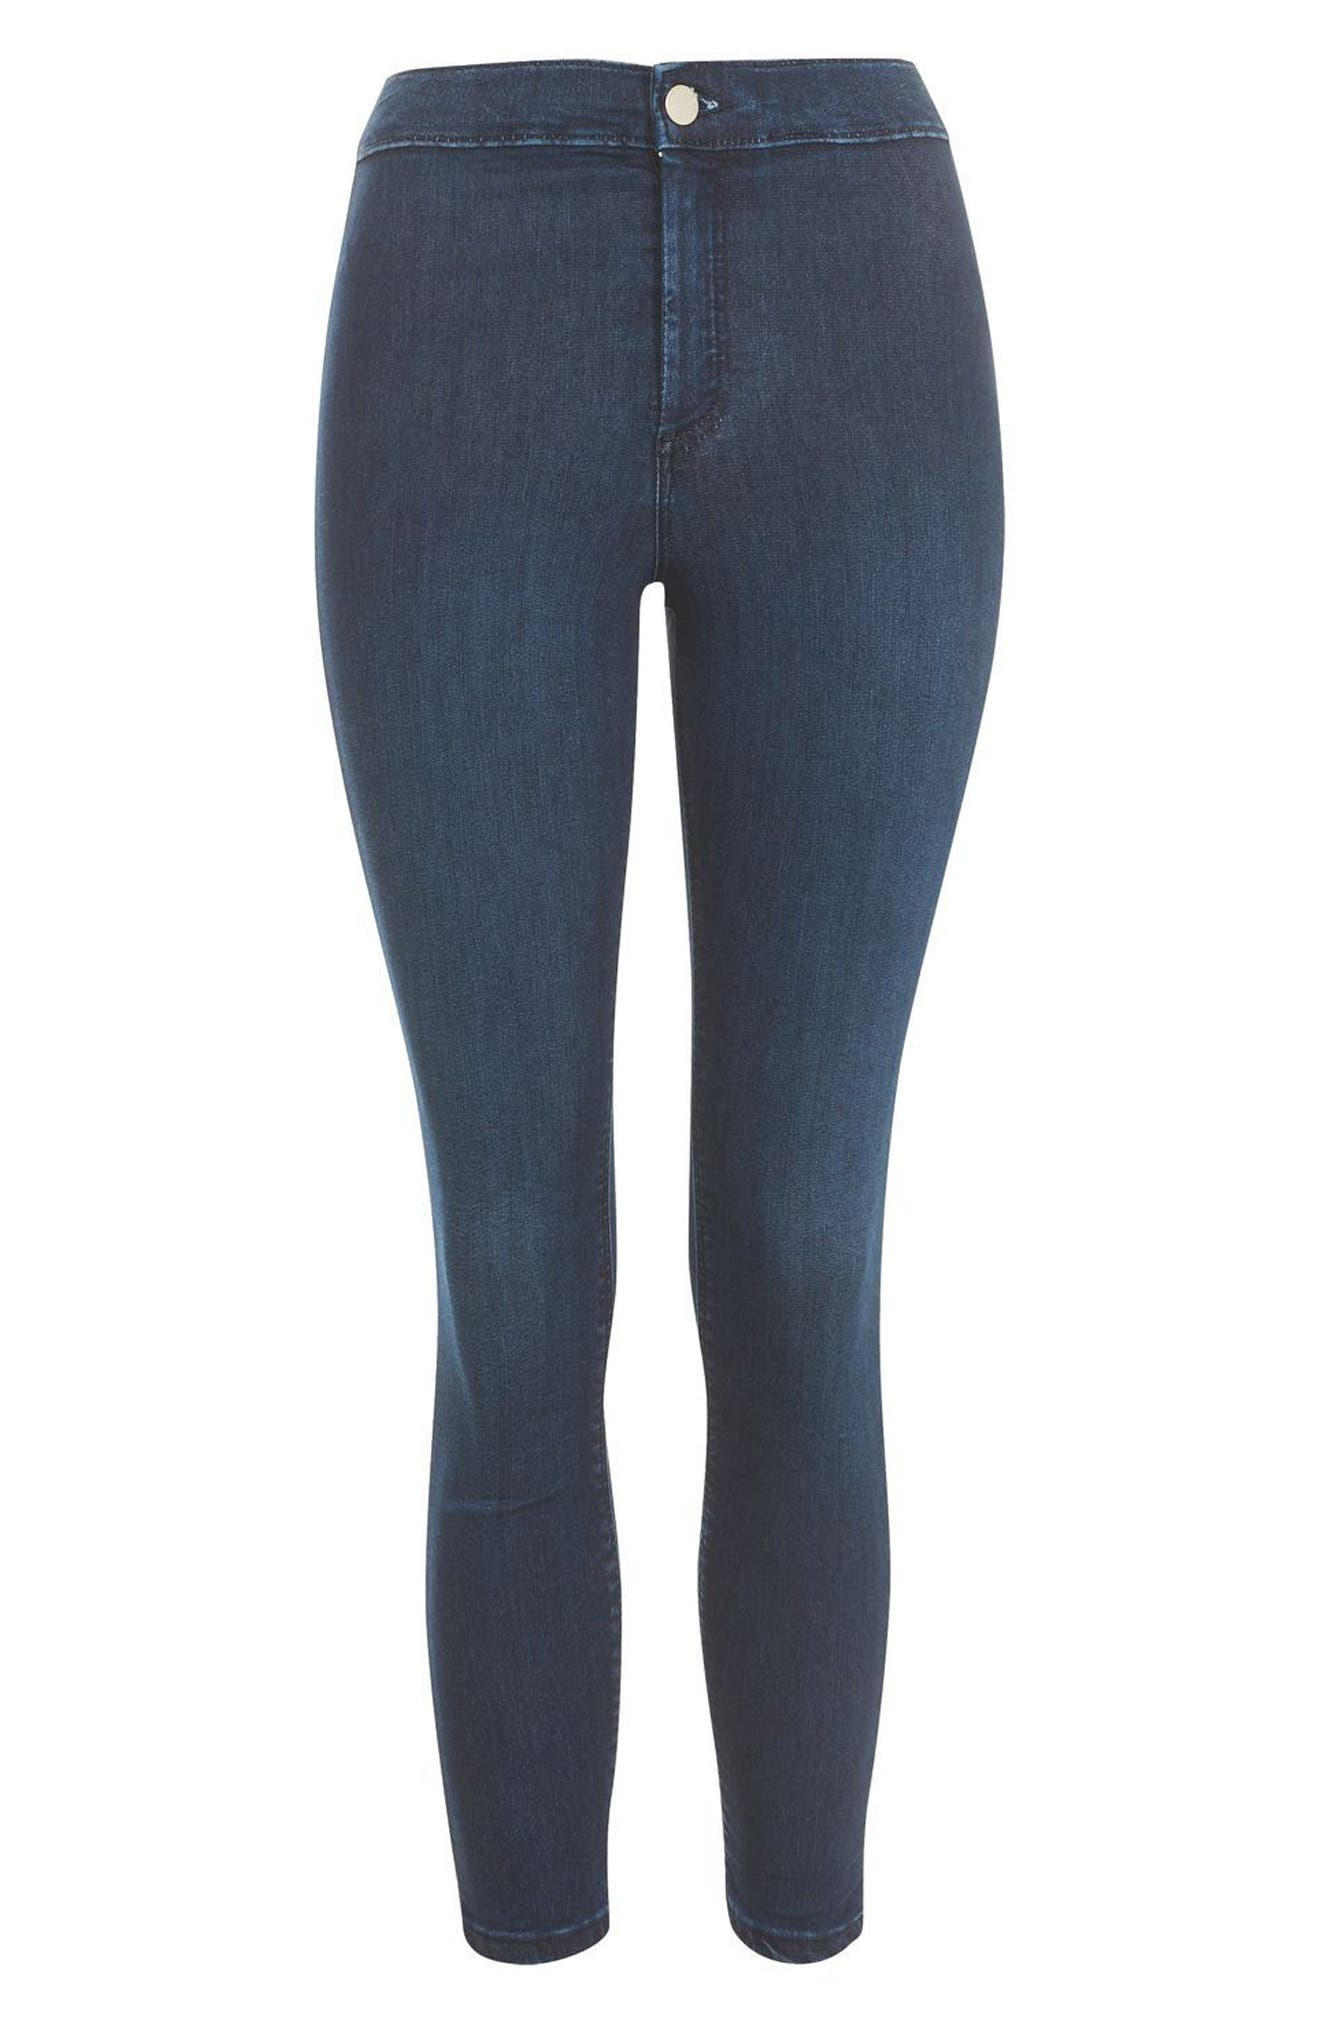 Joni High Waist Skinny Jeans,                             Alternate thumbnail 3, color,                             400